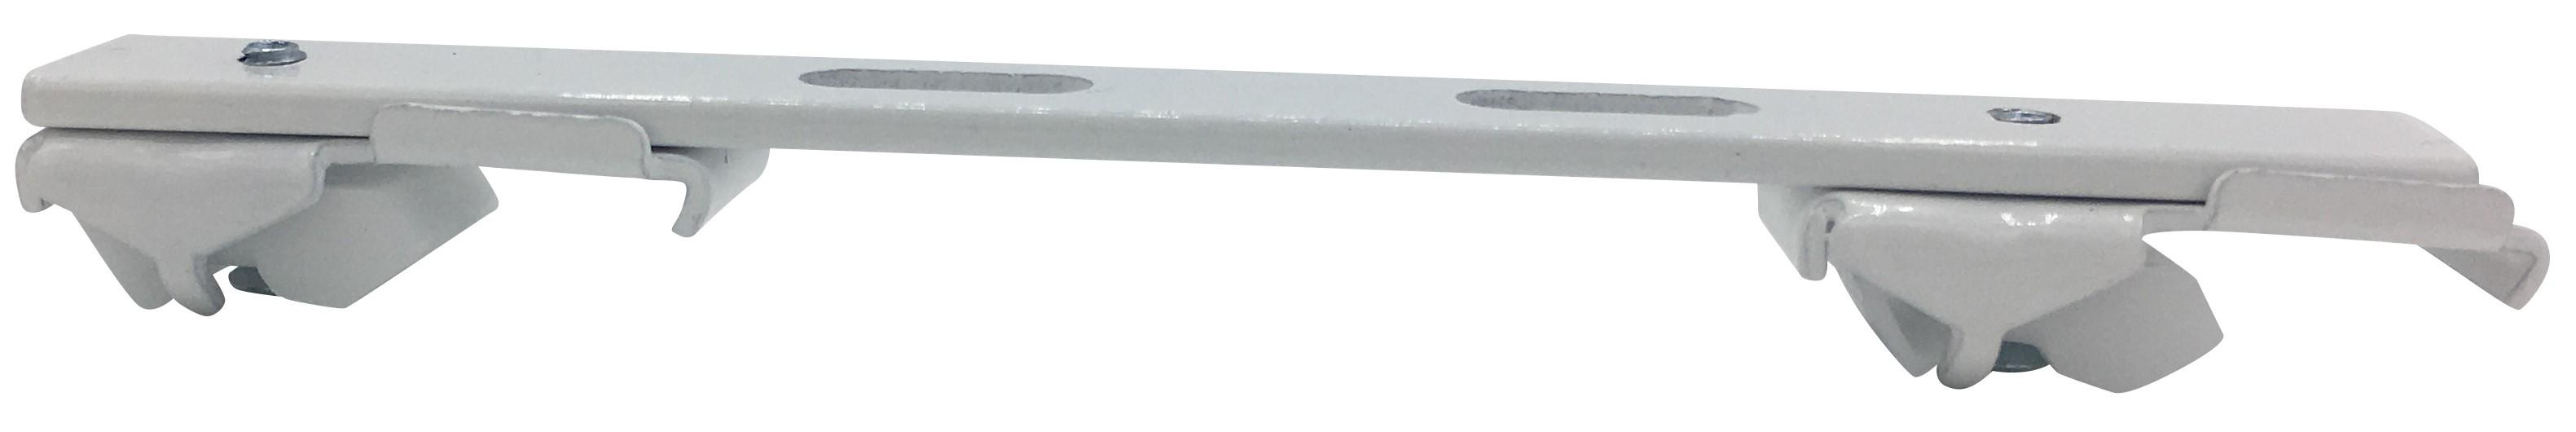 Support Tringle Rideau Plafond ks - 43 west